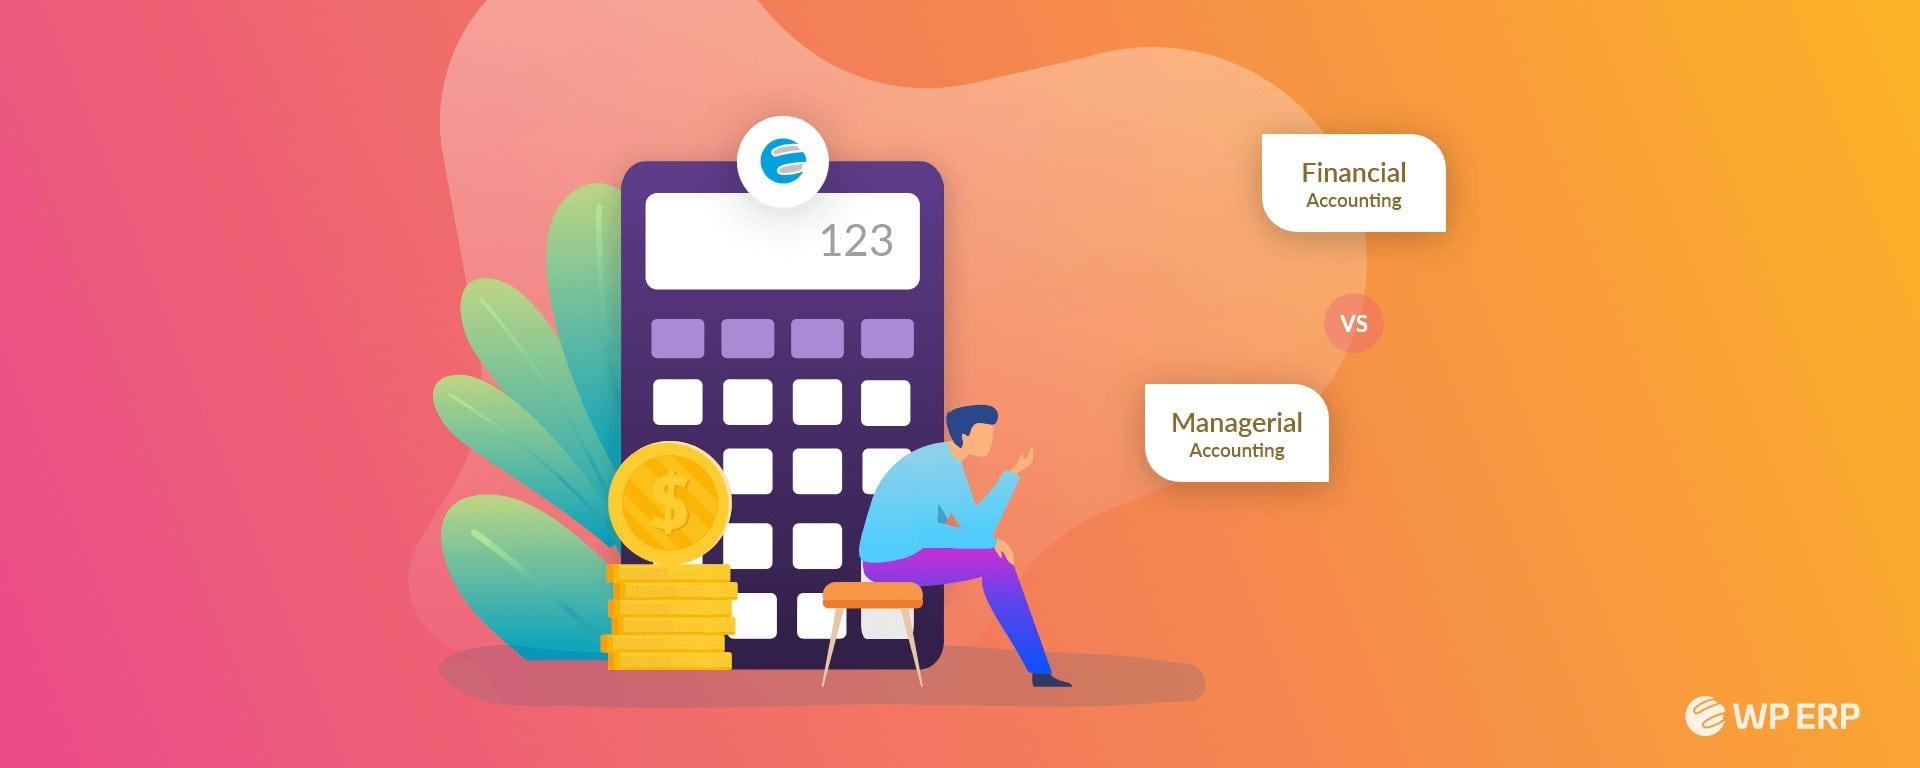 Financial-accounting-vs-managerial-accounting